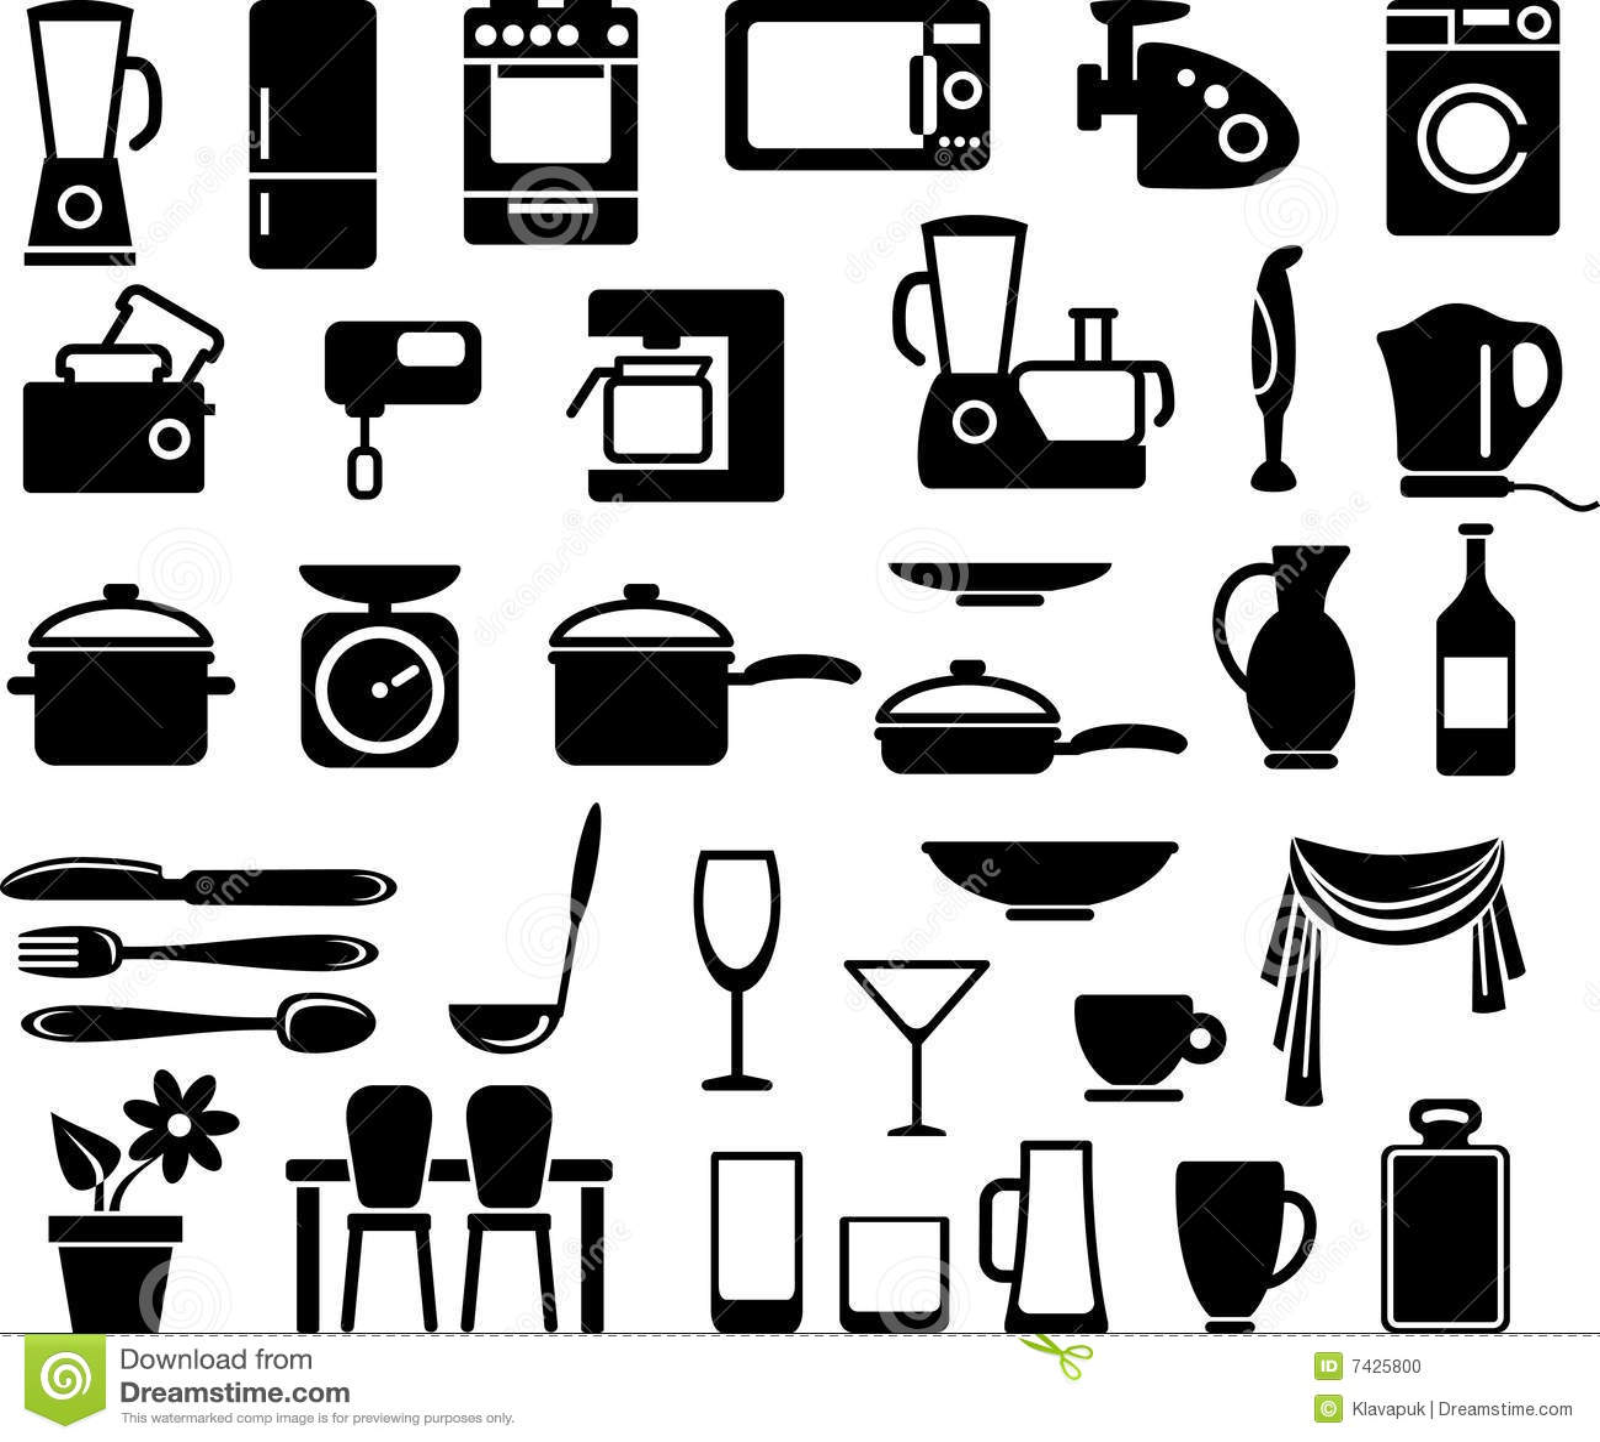 Names Of Kitchen Appliances Kitchen Appliances Royalty Free Stock Images Image 3547179